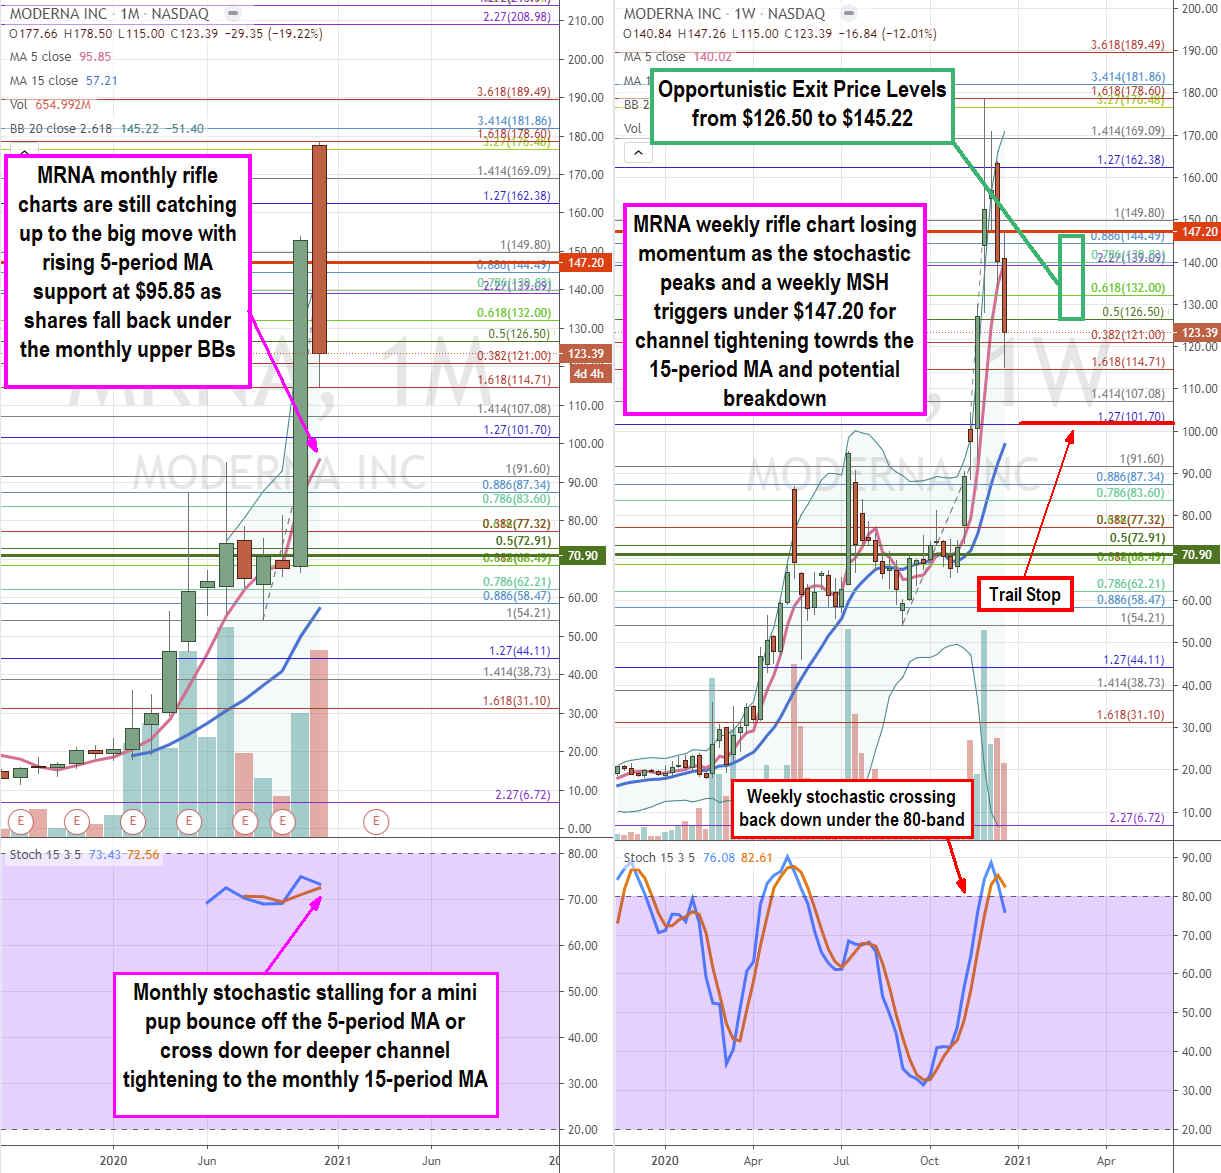 Time to Sell the News on Moderna (NASDAQ: MRNA) Stock